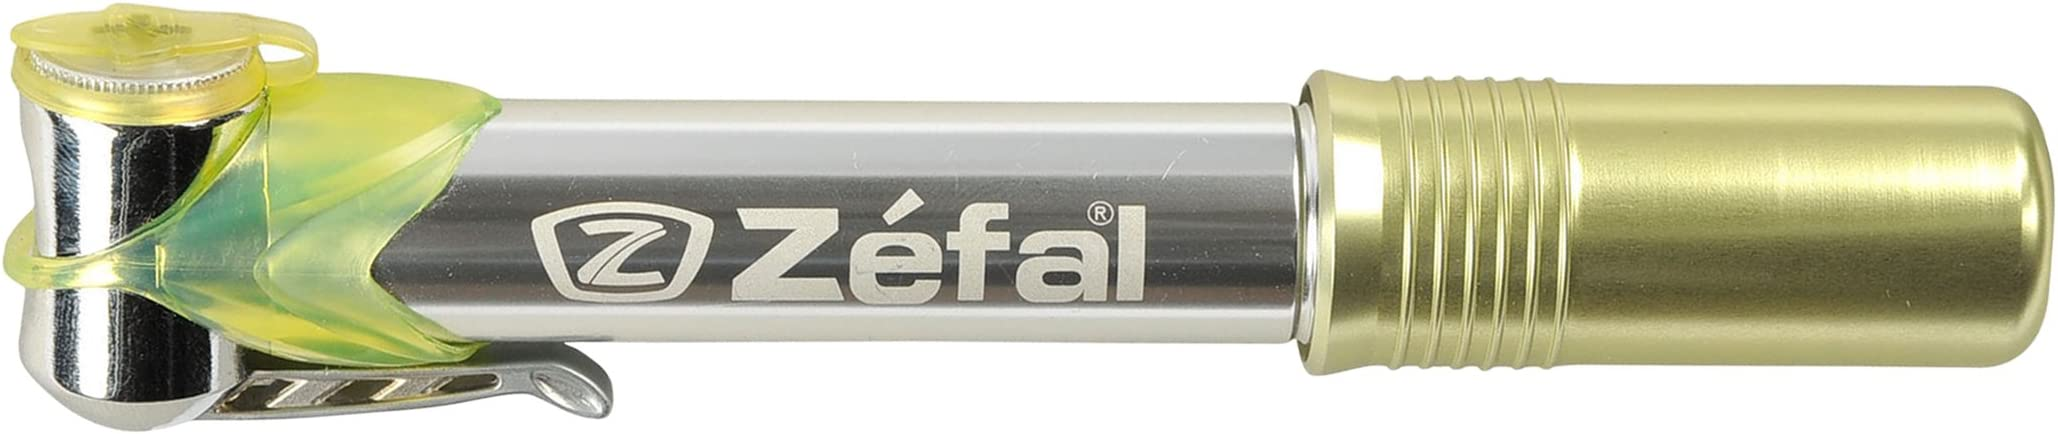 Zefal Air Profil Micro Alloy 88g Mini bomba: Amazon.es: Deportes y ...